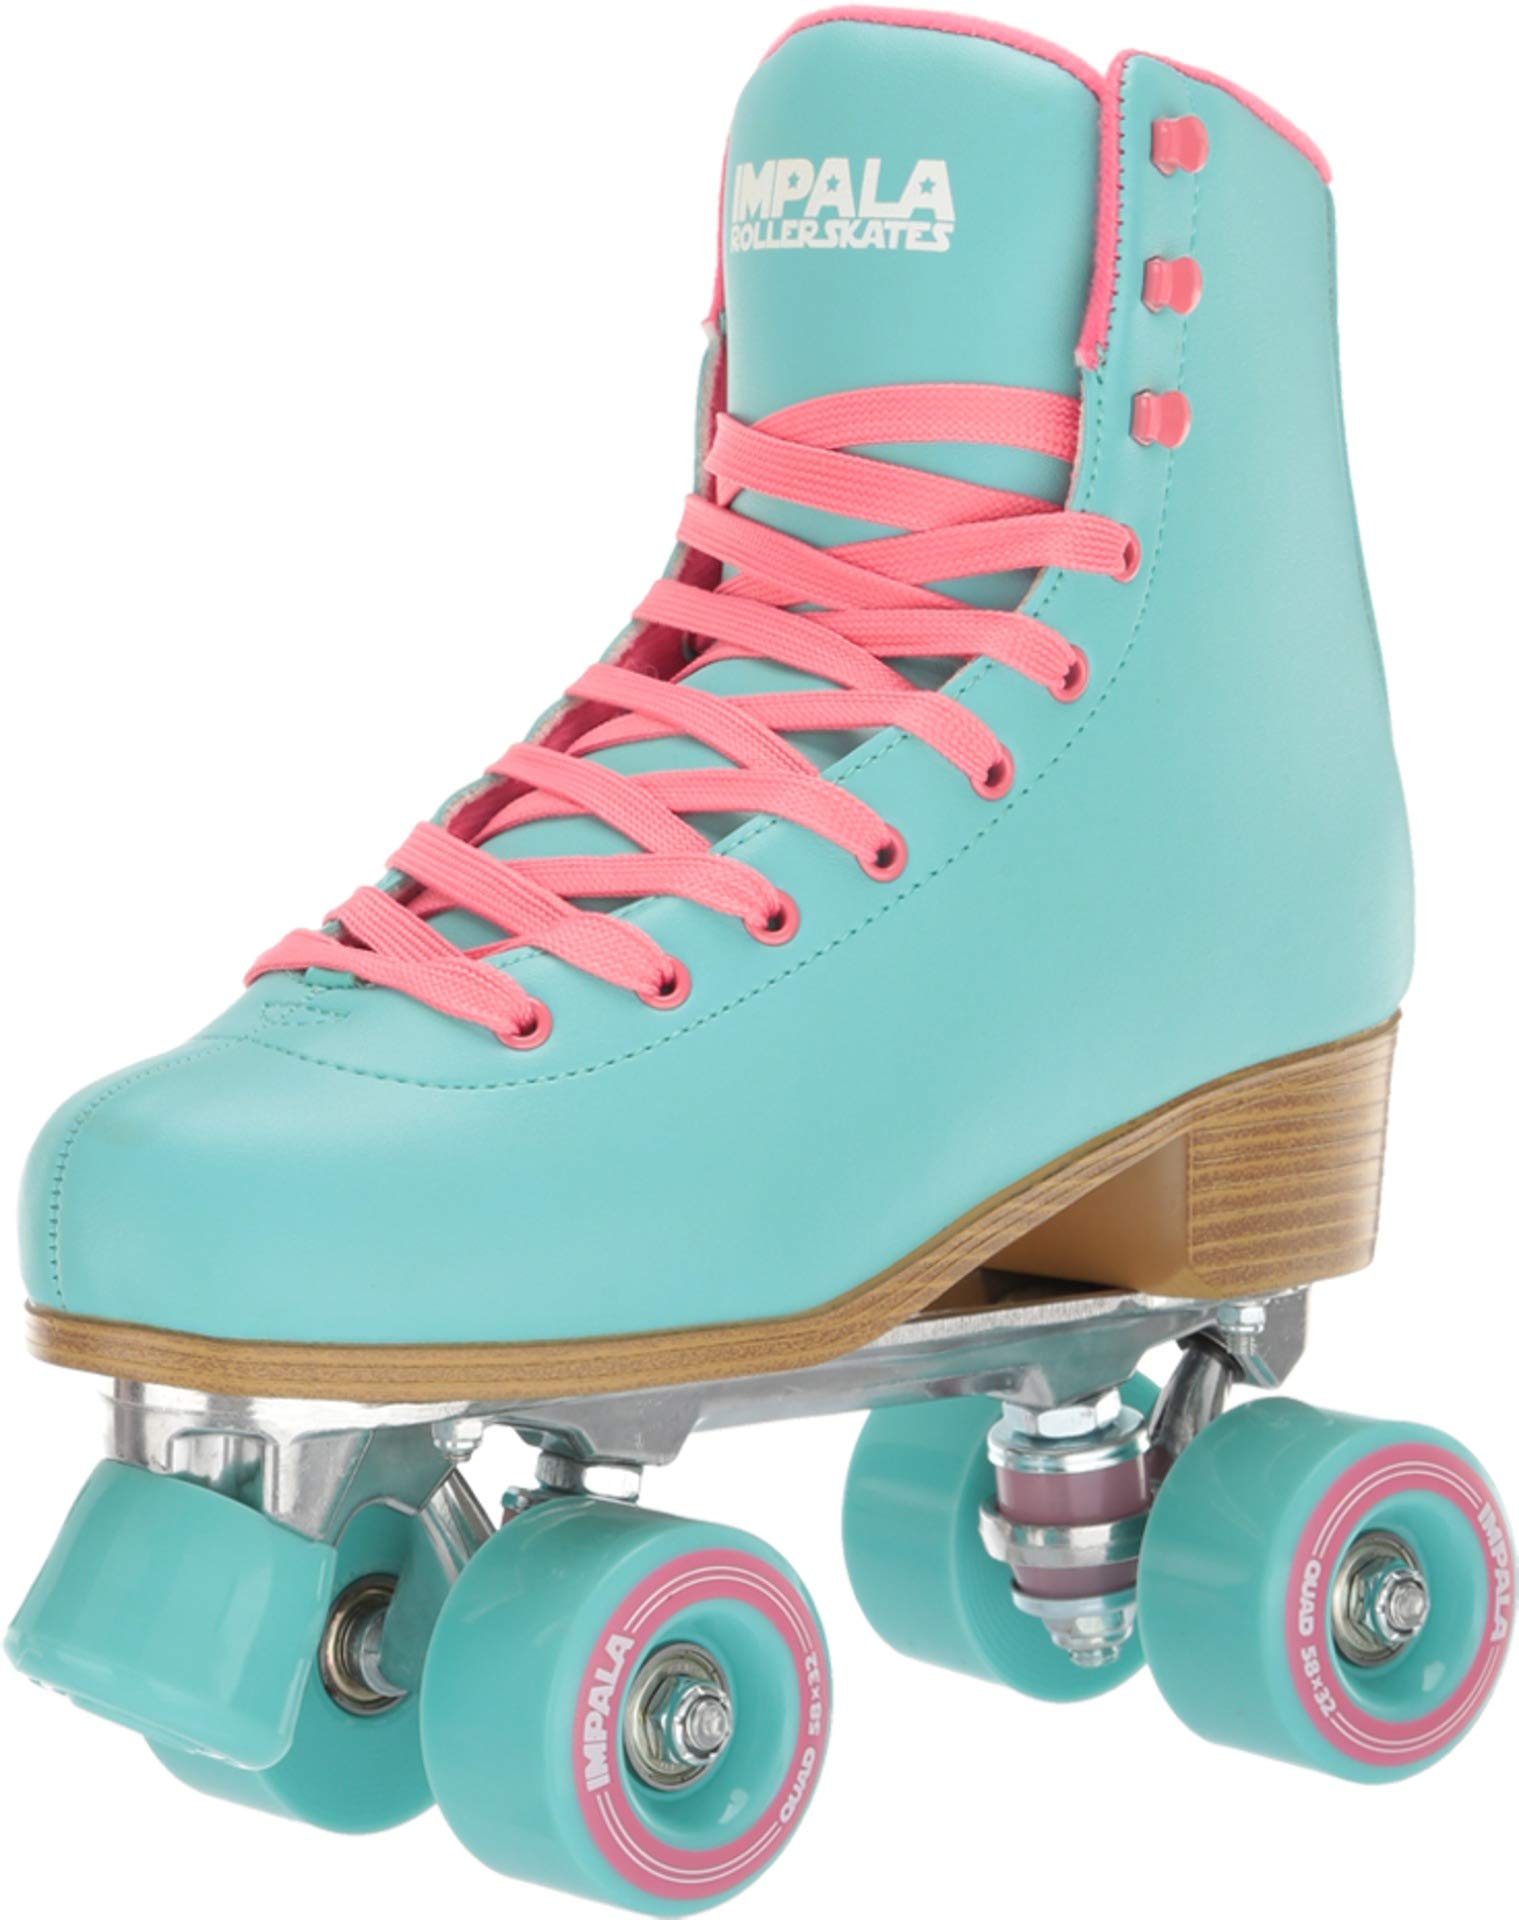 Impala Rollerskates Girl's Impala Quad Skate (Big Kid/Adult) Aqua 6 M by Impala RollerSkates